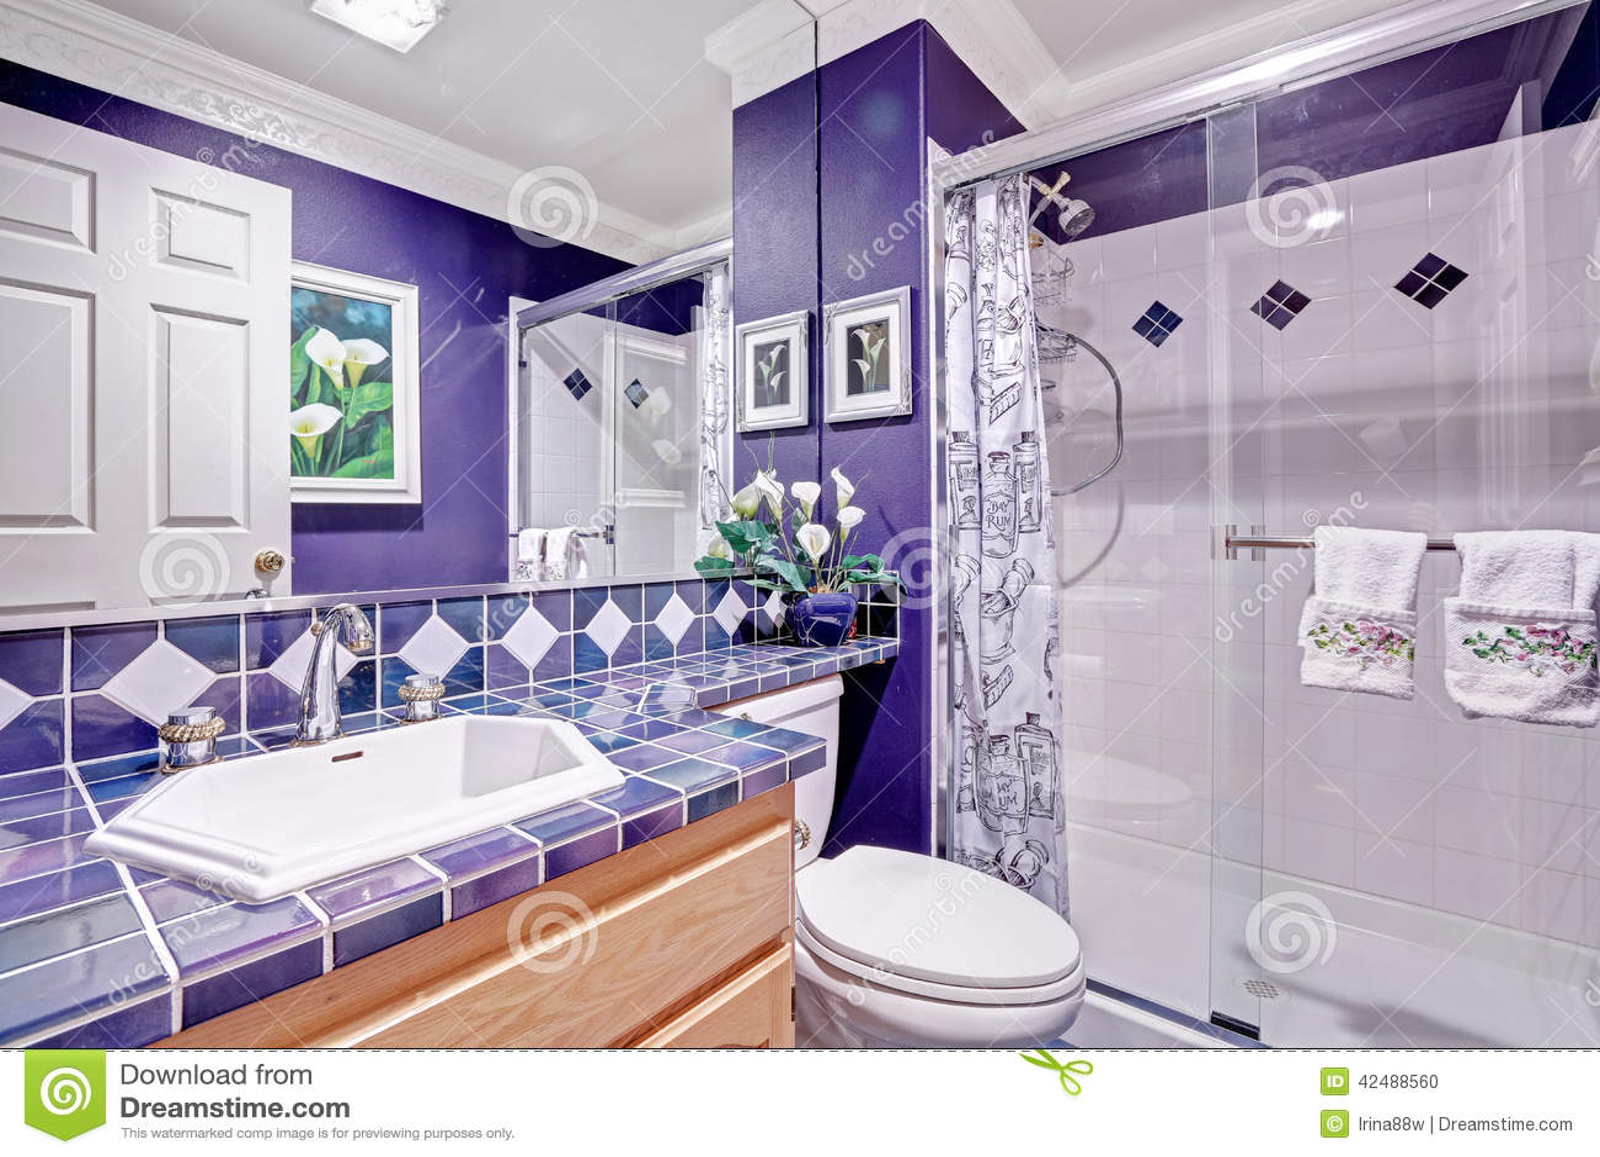 bright purple bathroom interior stock photo - image: 42488560